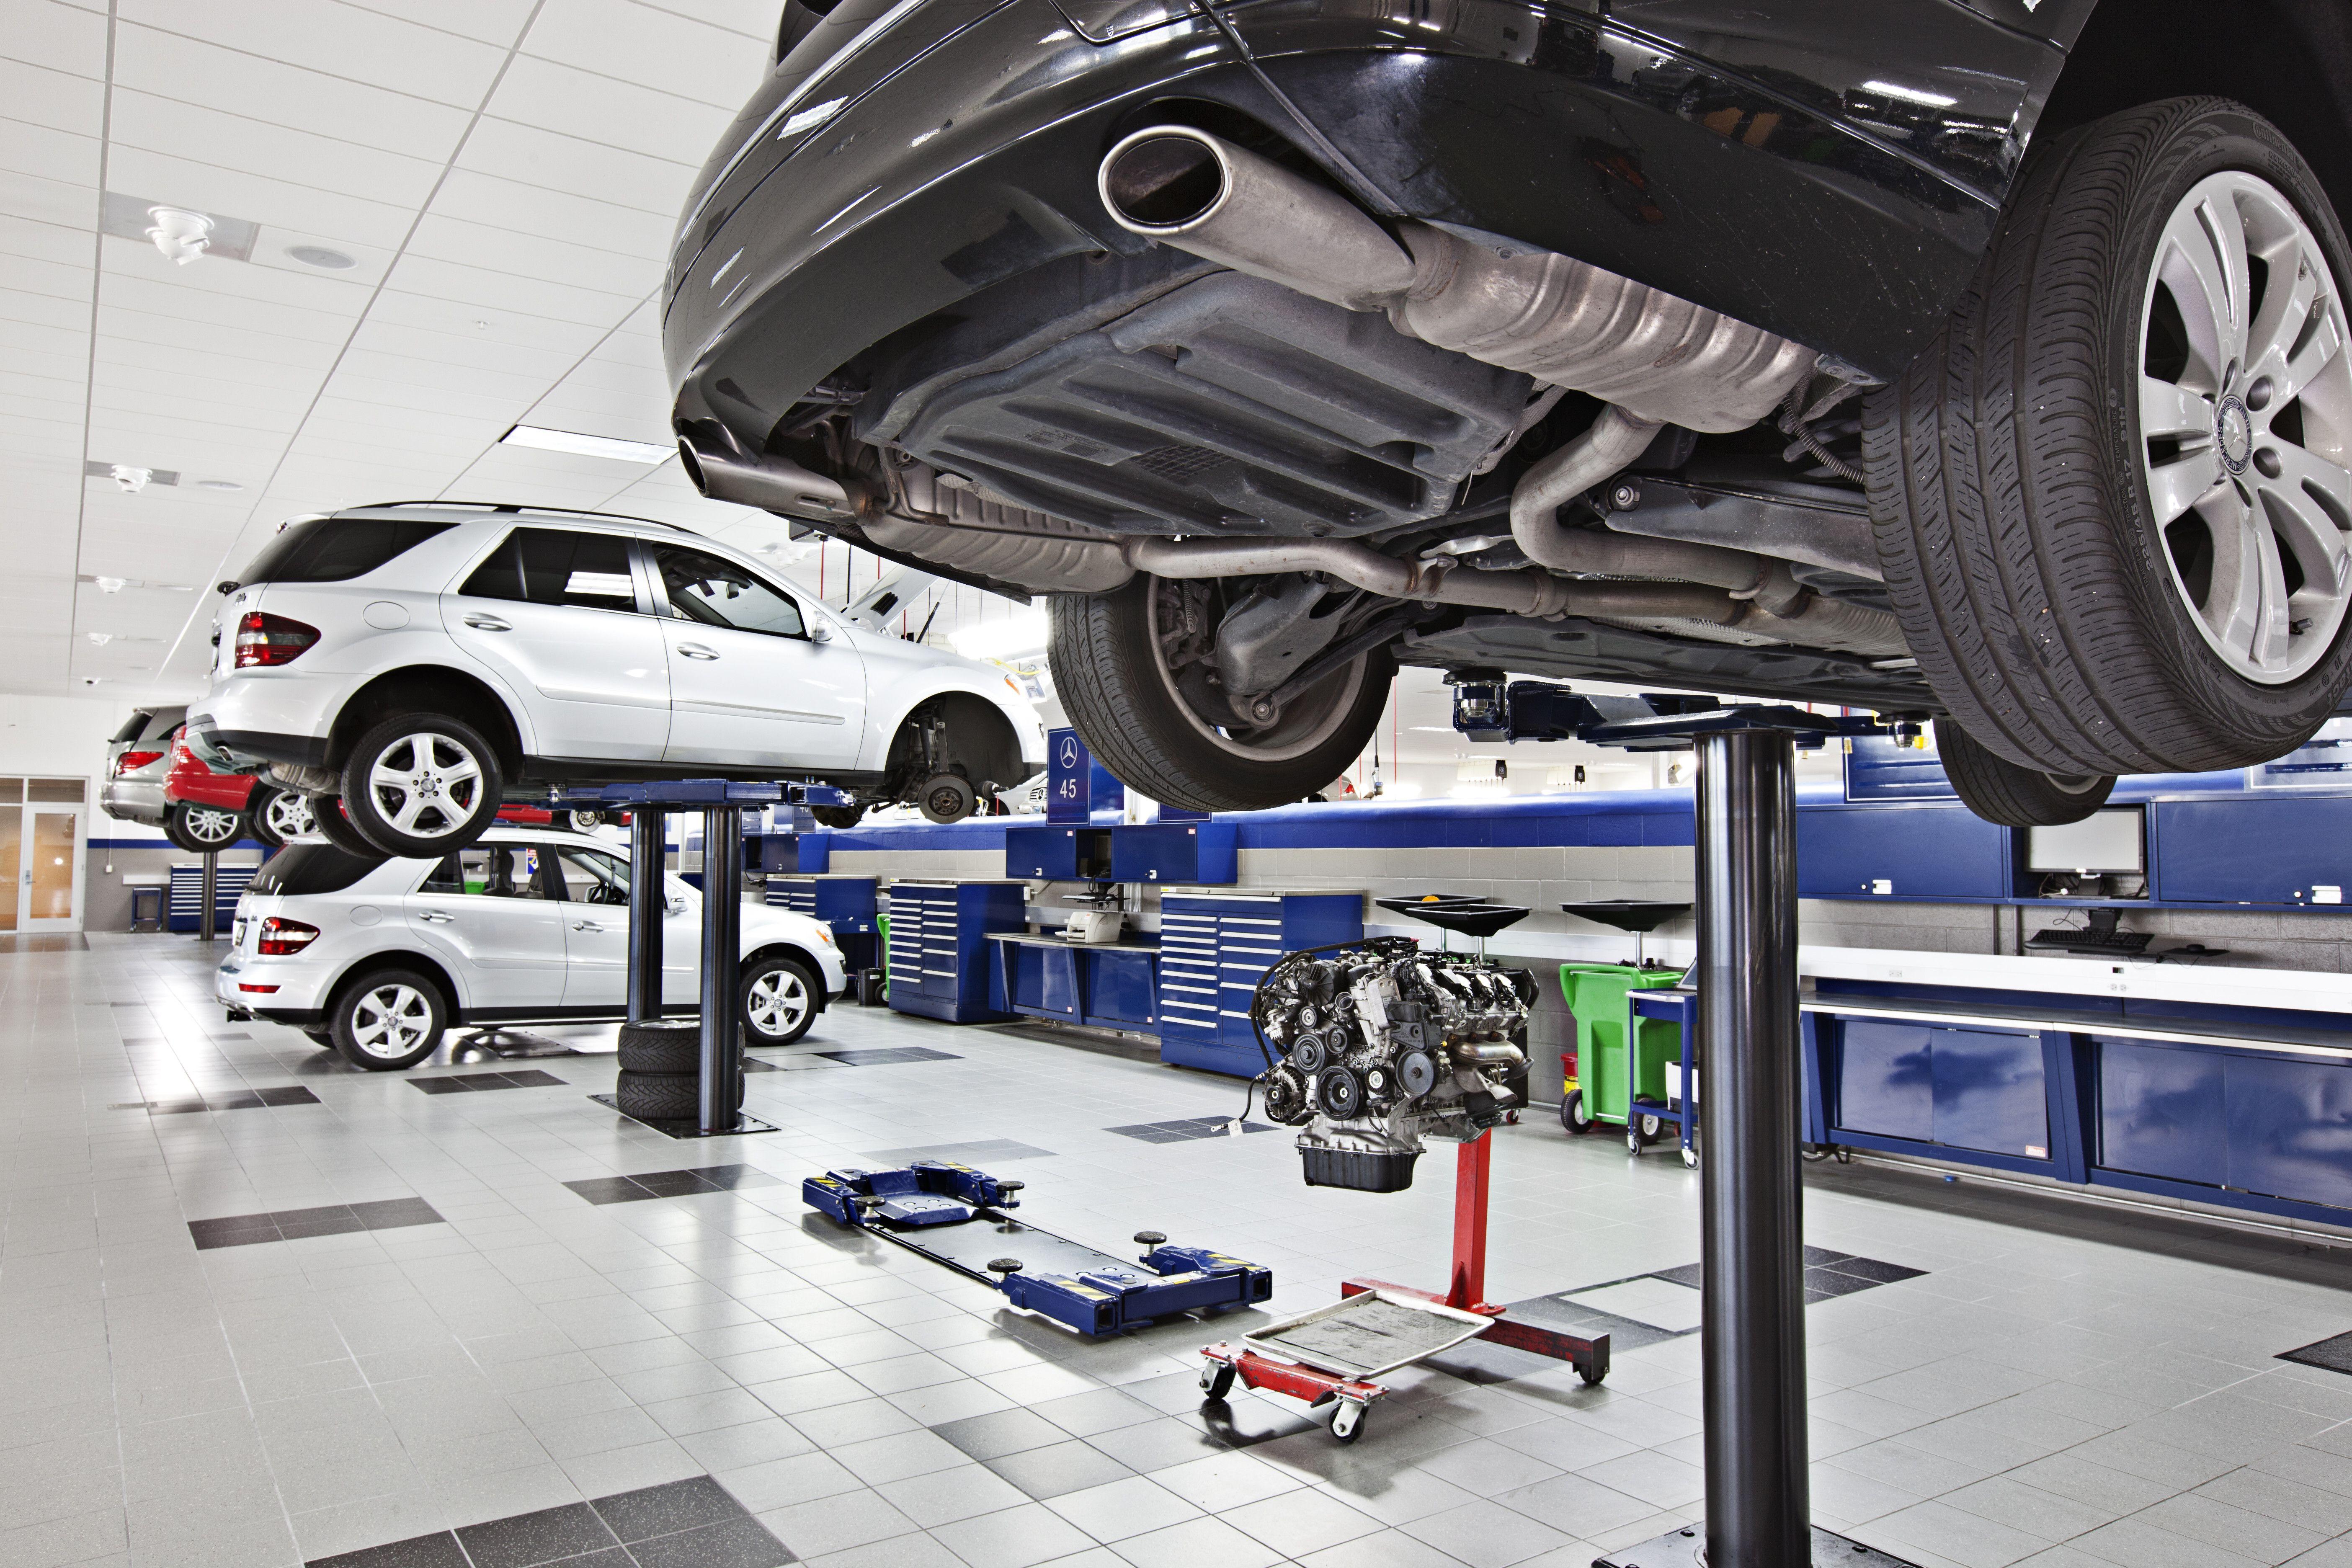 State of the art MercedesBenz mechanical shop in